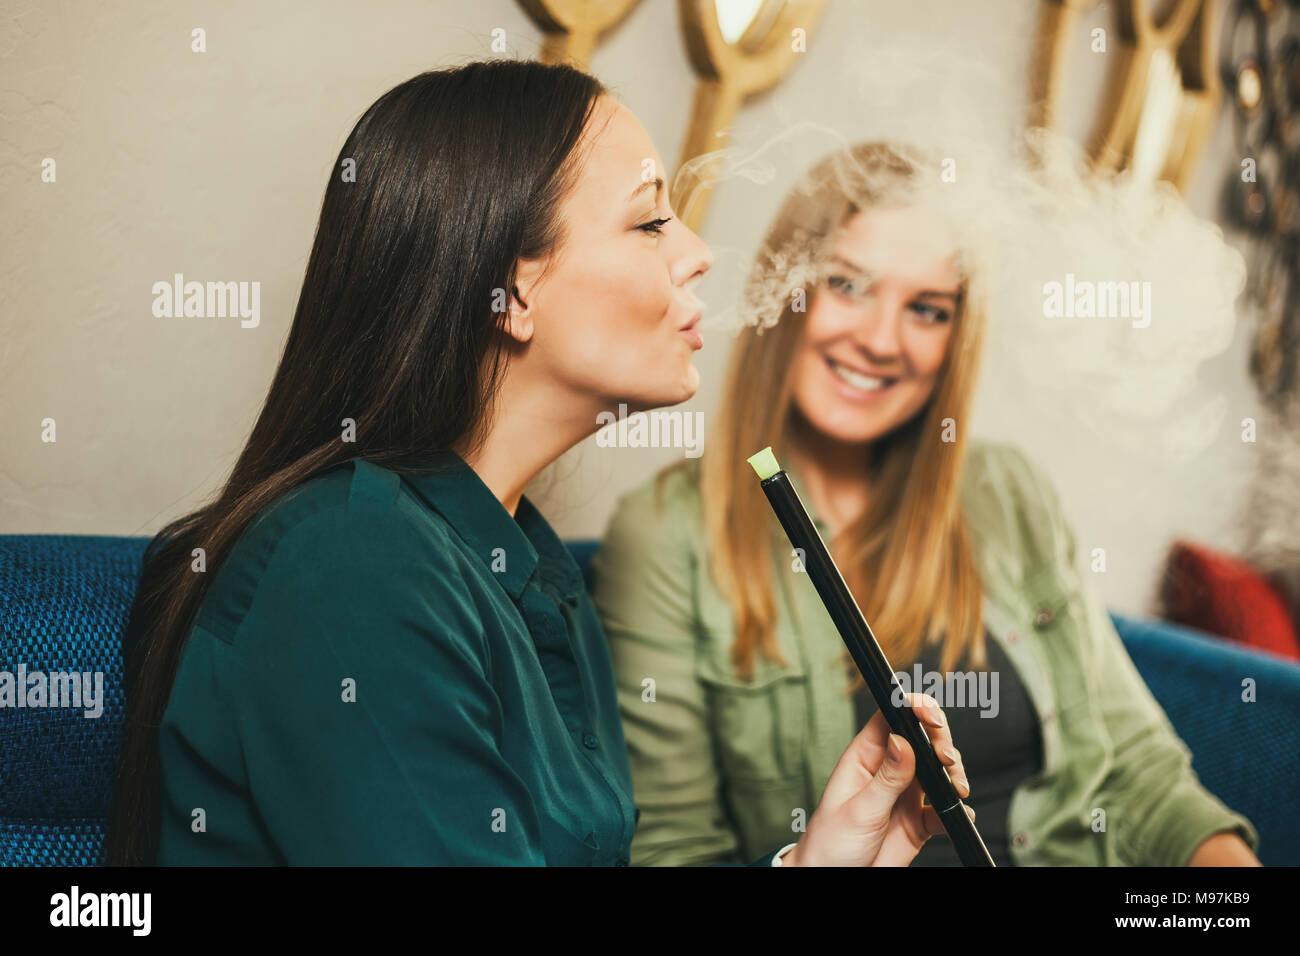 Due felici donne sono seduti nel bar shisha e nargile fumatori Immagini Stock